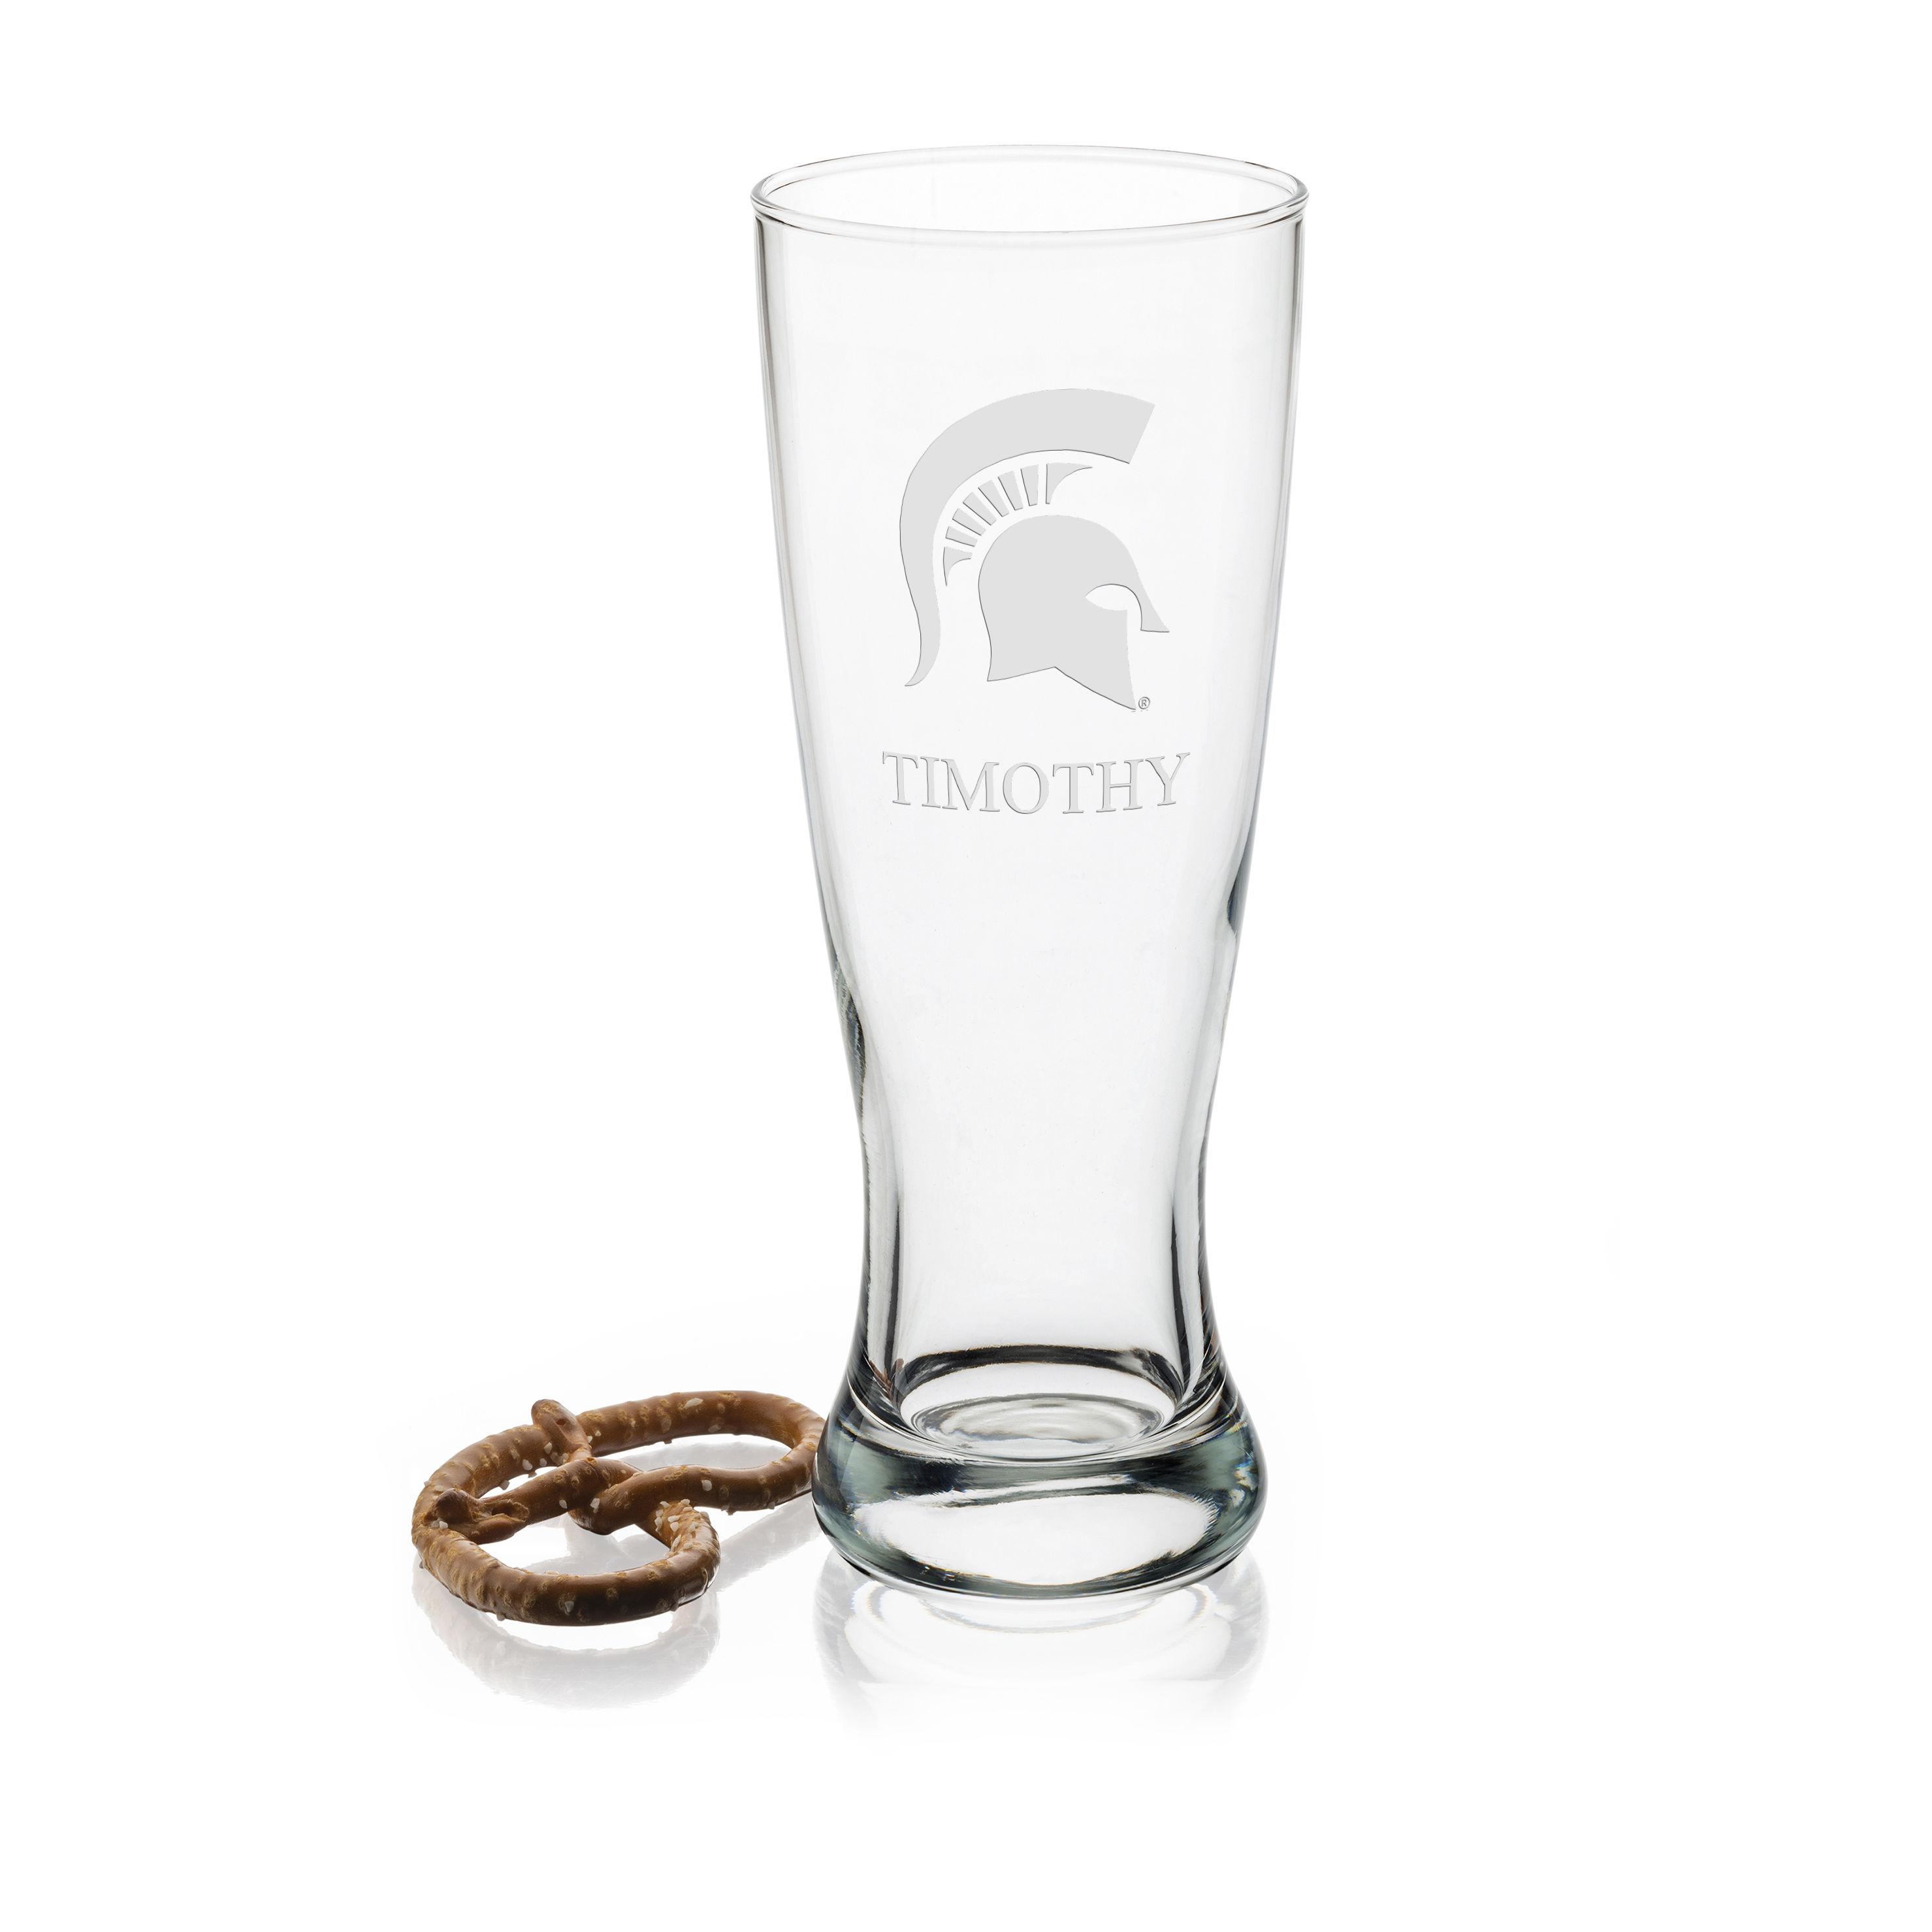 Michigan State 20oz Pilsner Glasses - Set of 2